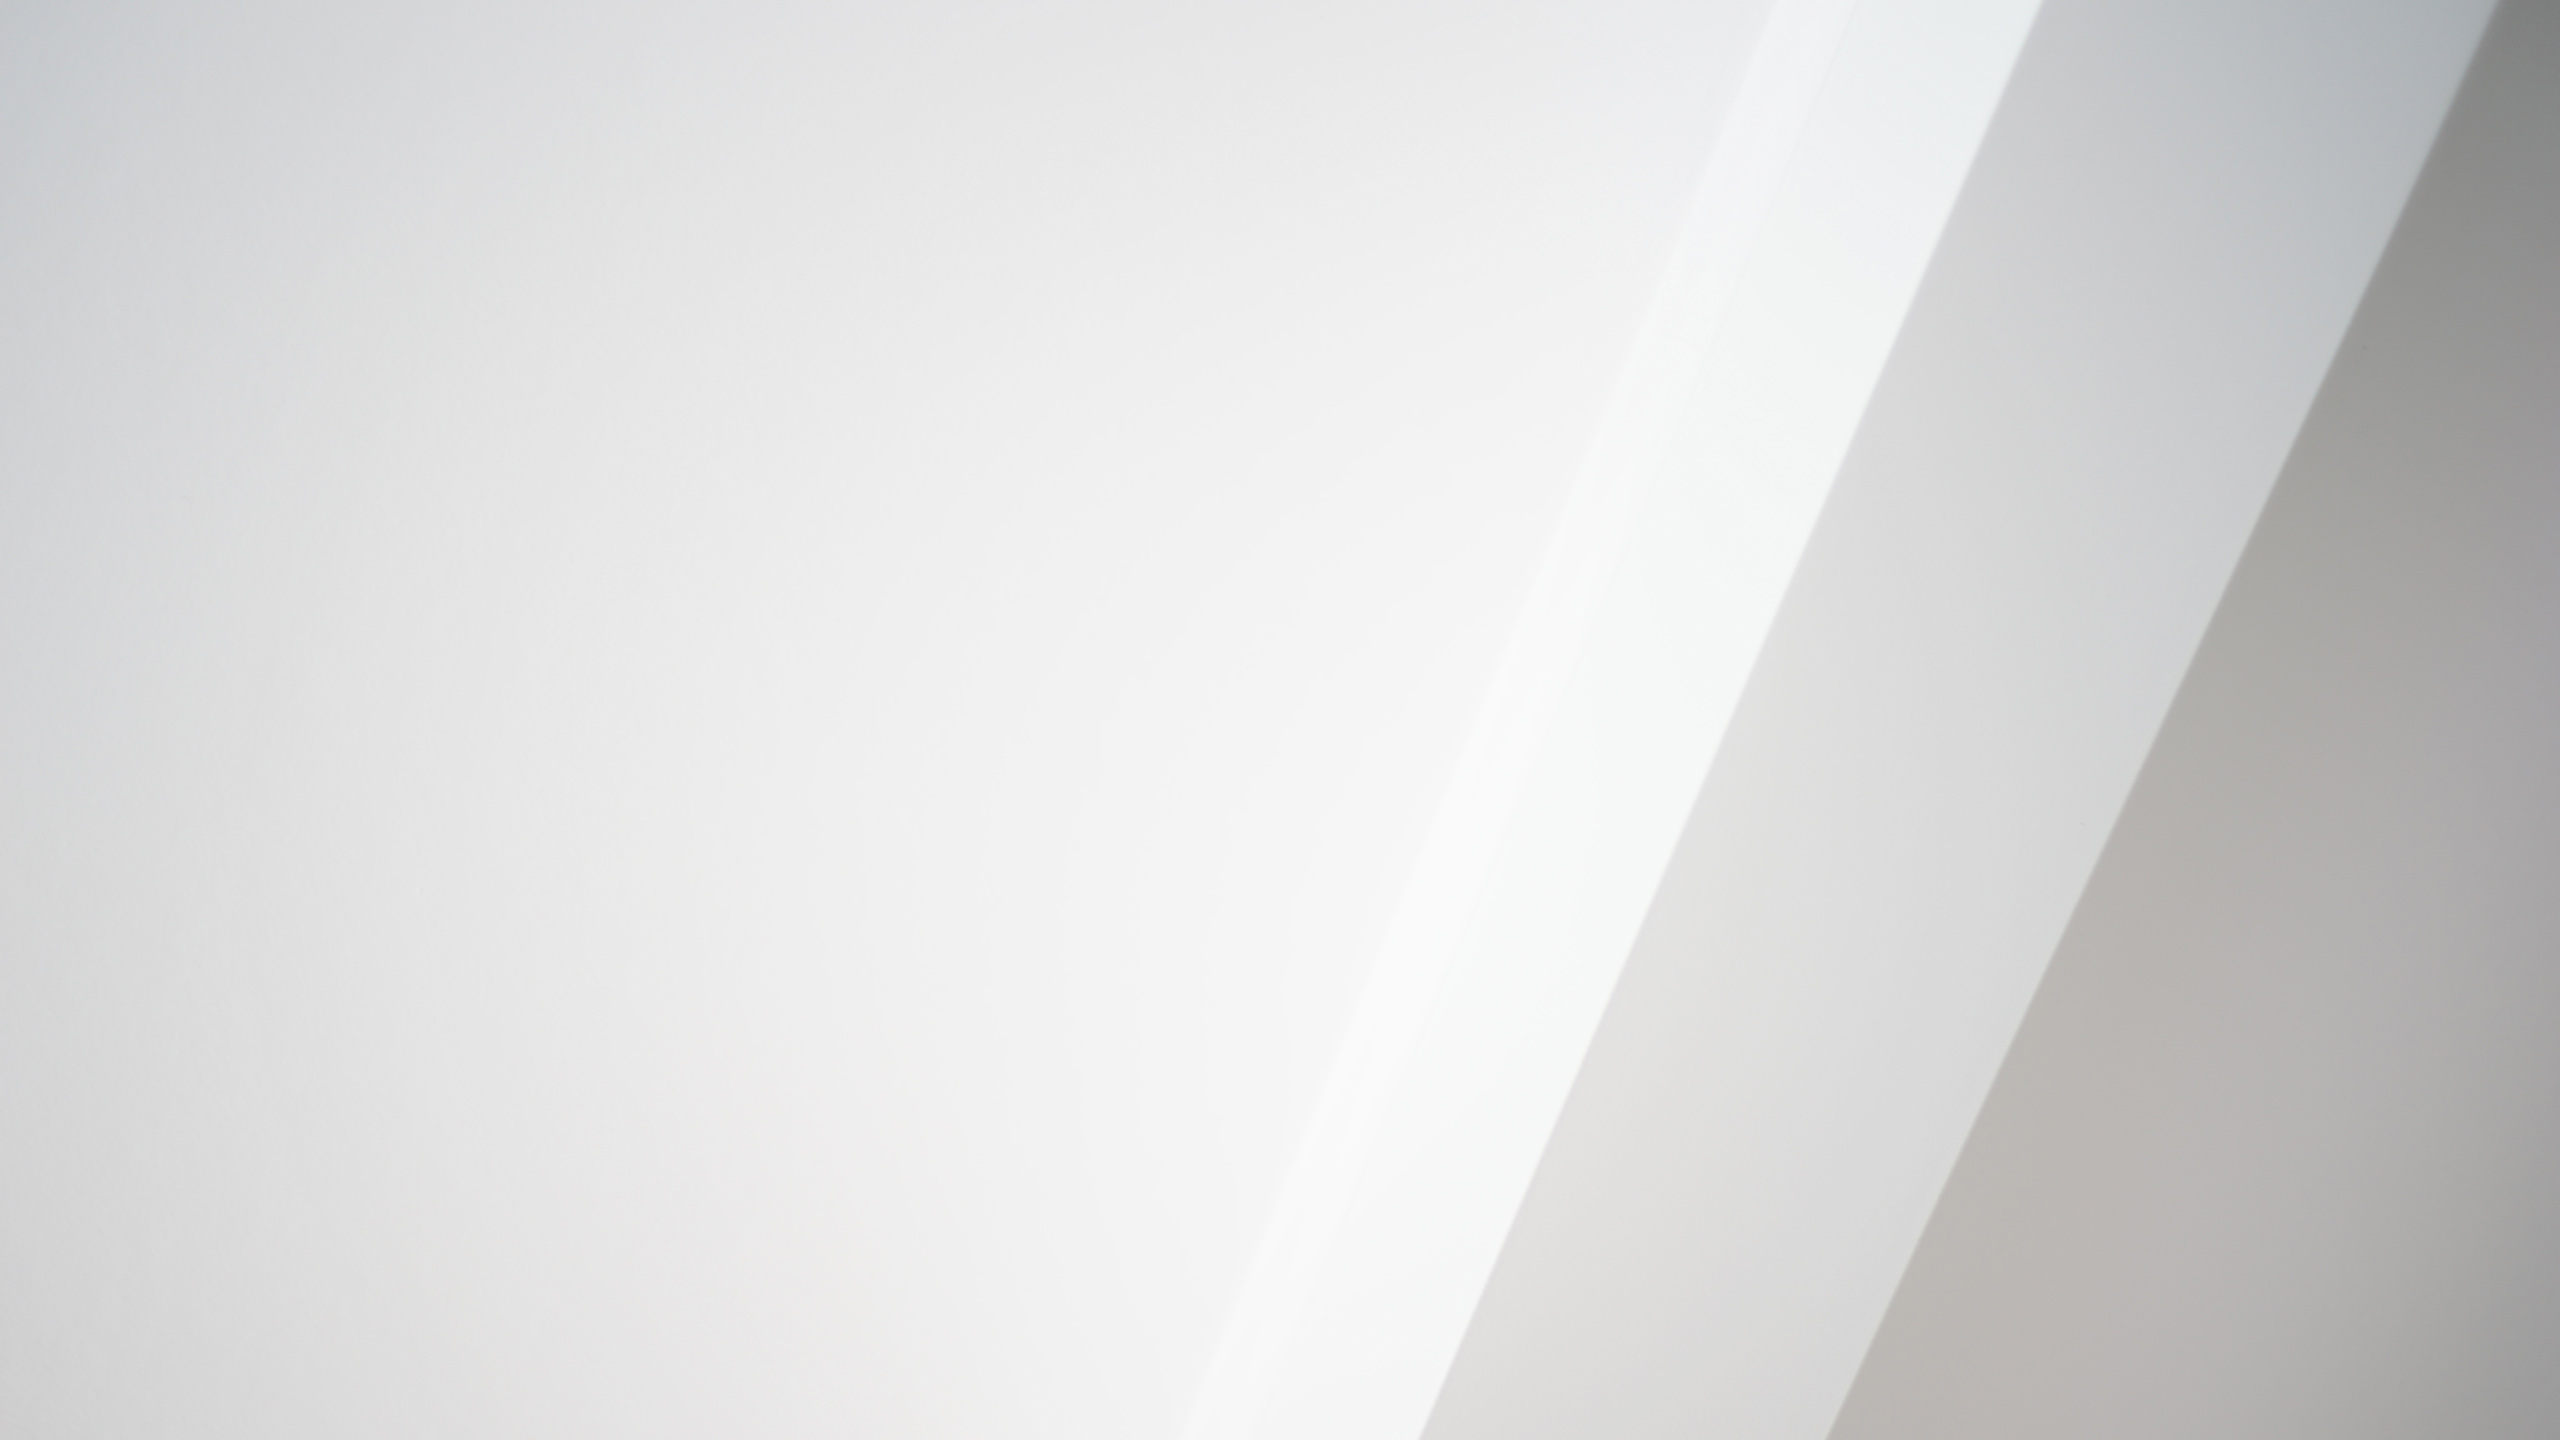 white low key minimalist wallpaper by dtbsz 2560x1440